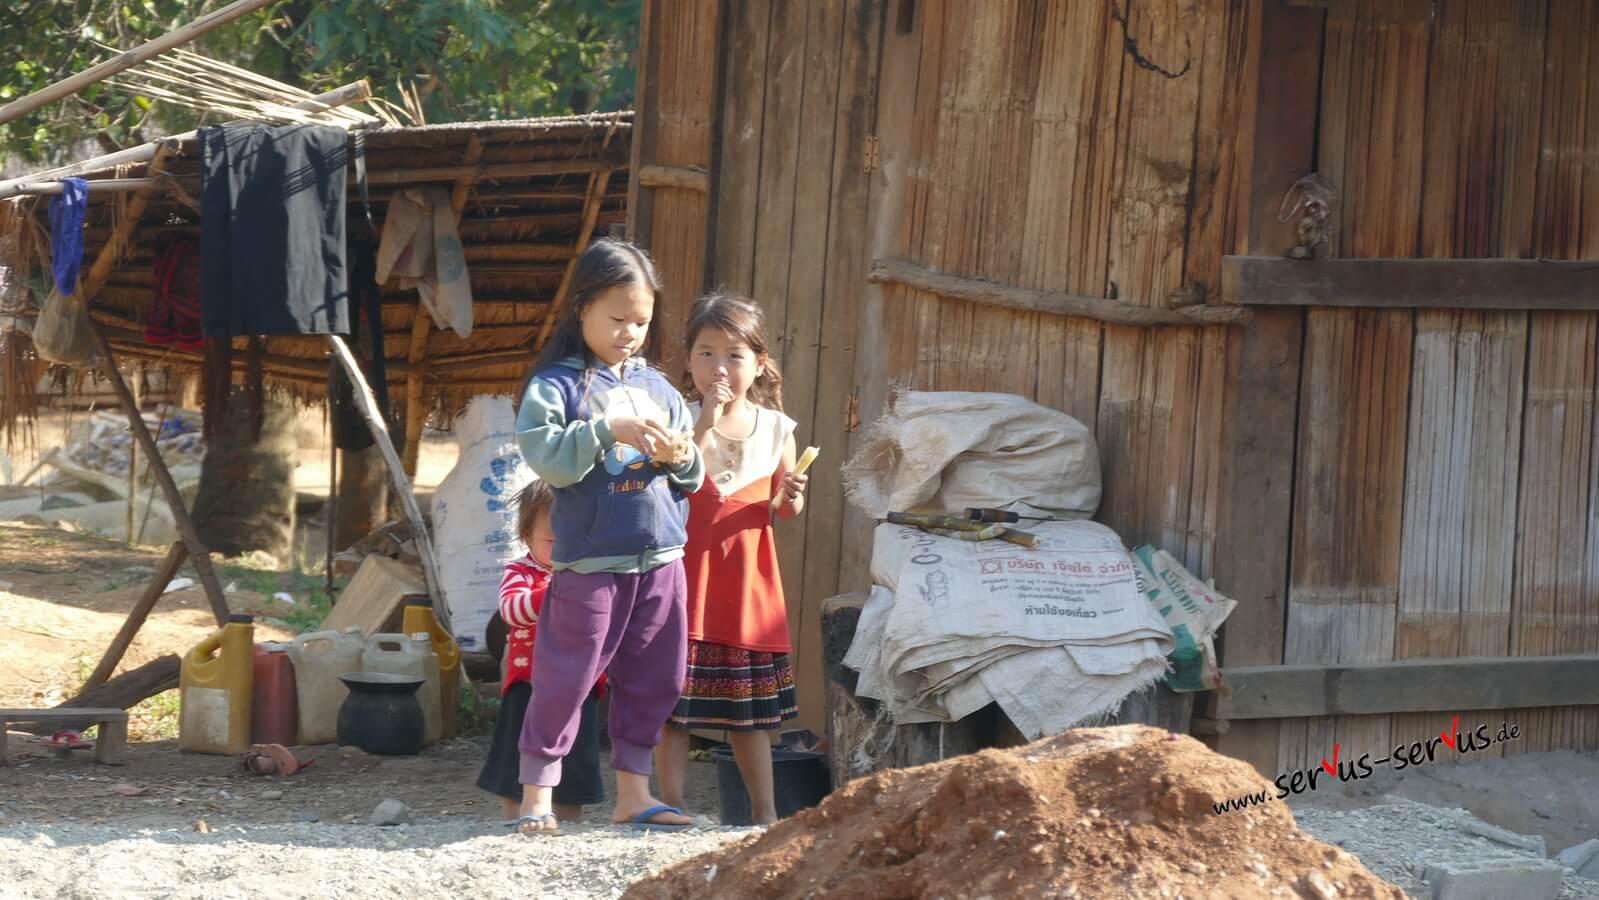 sawadee Kinder spielen am Straßenrand in Laos